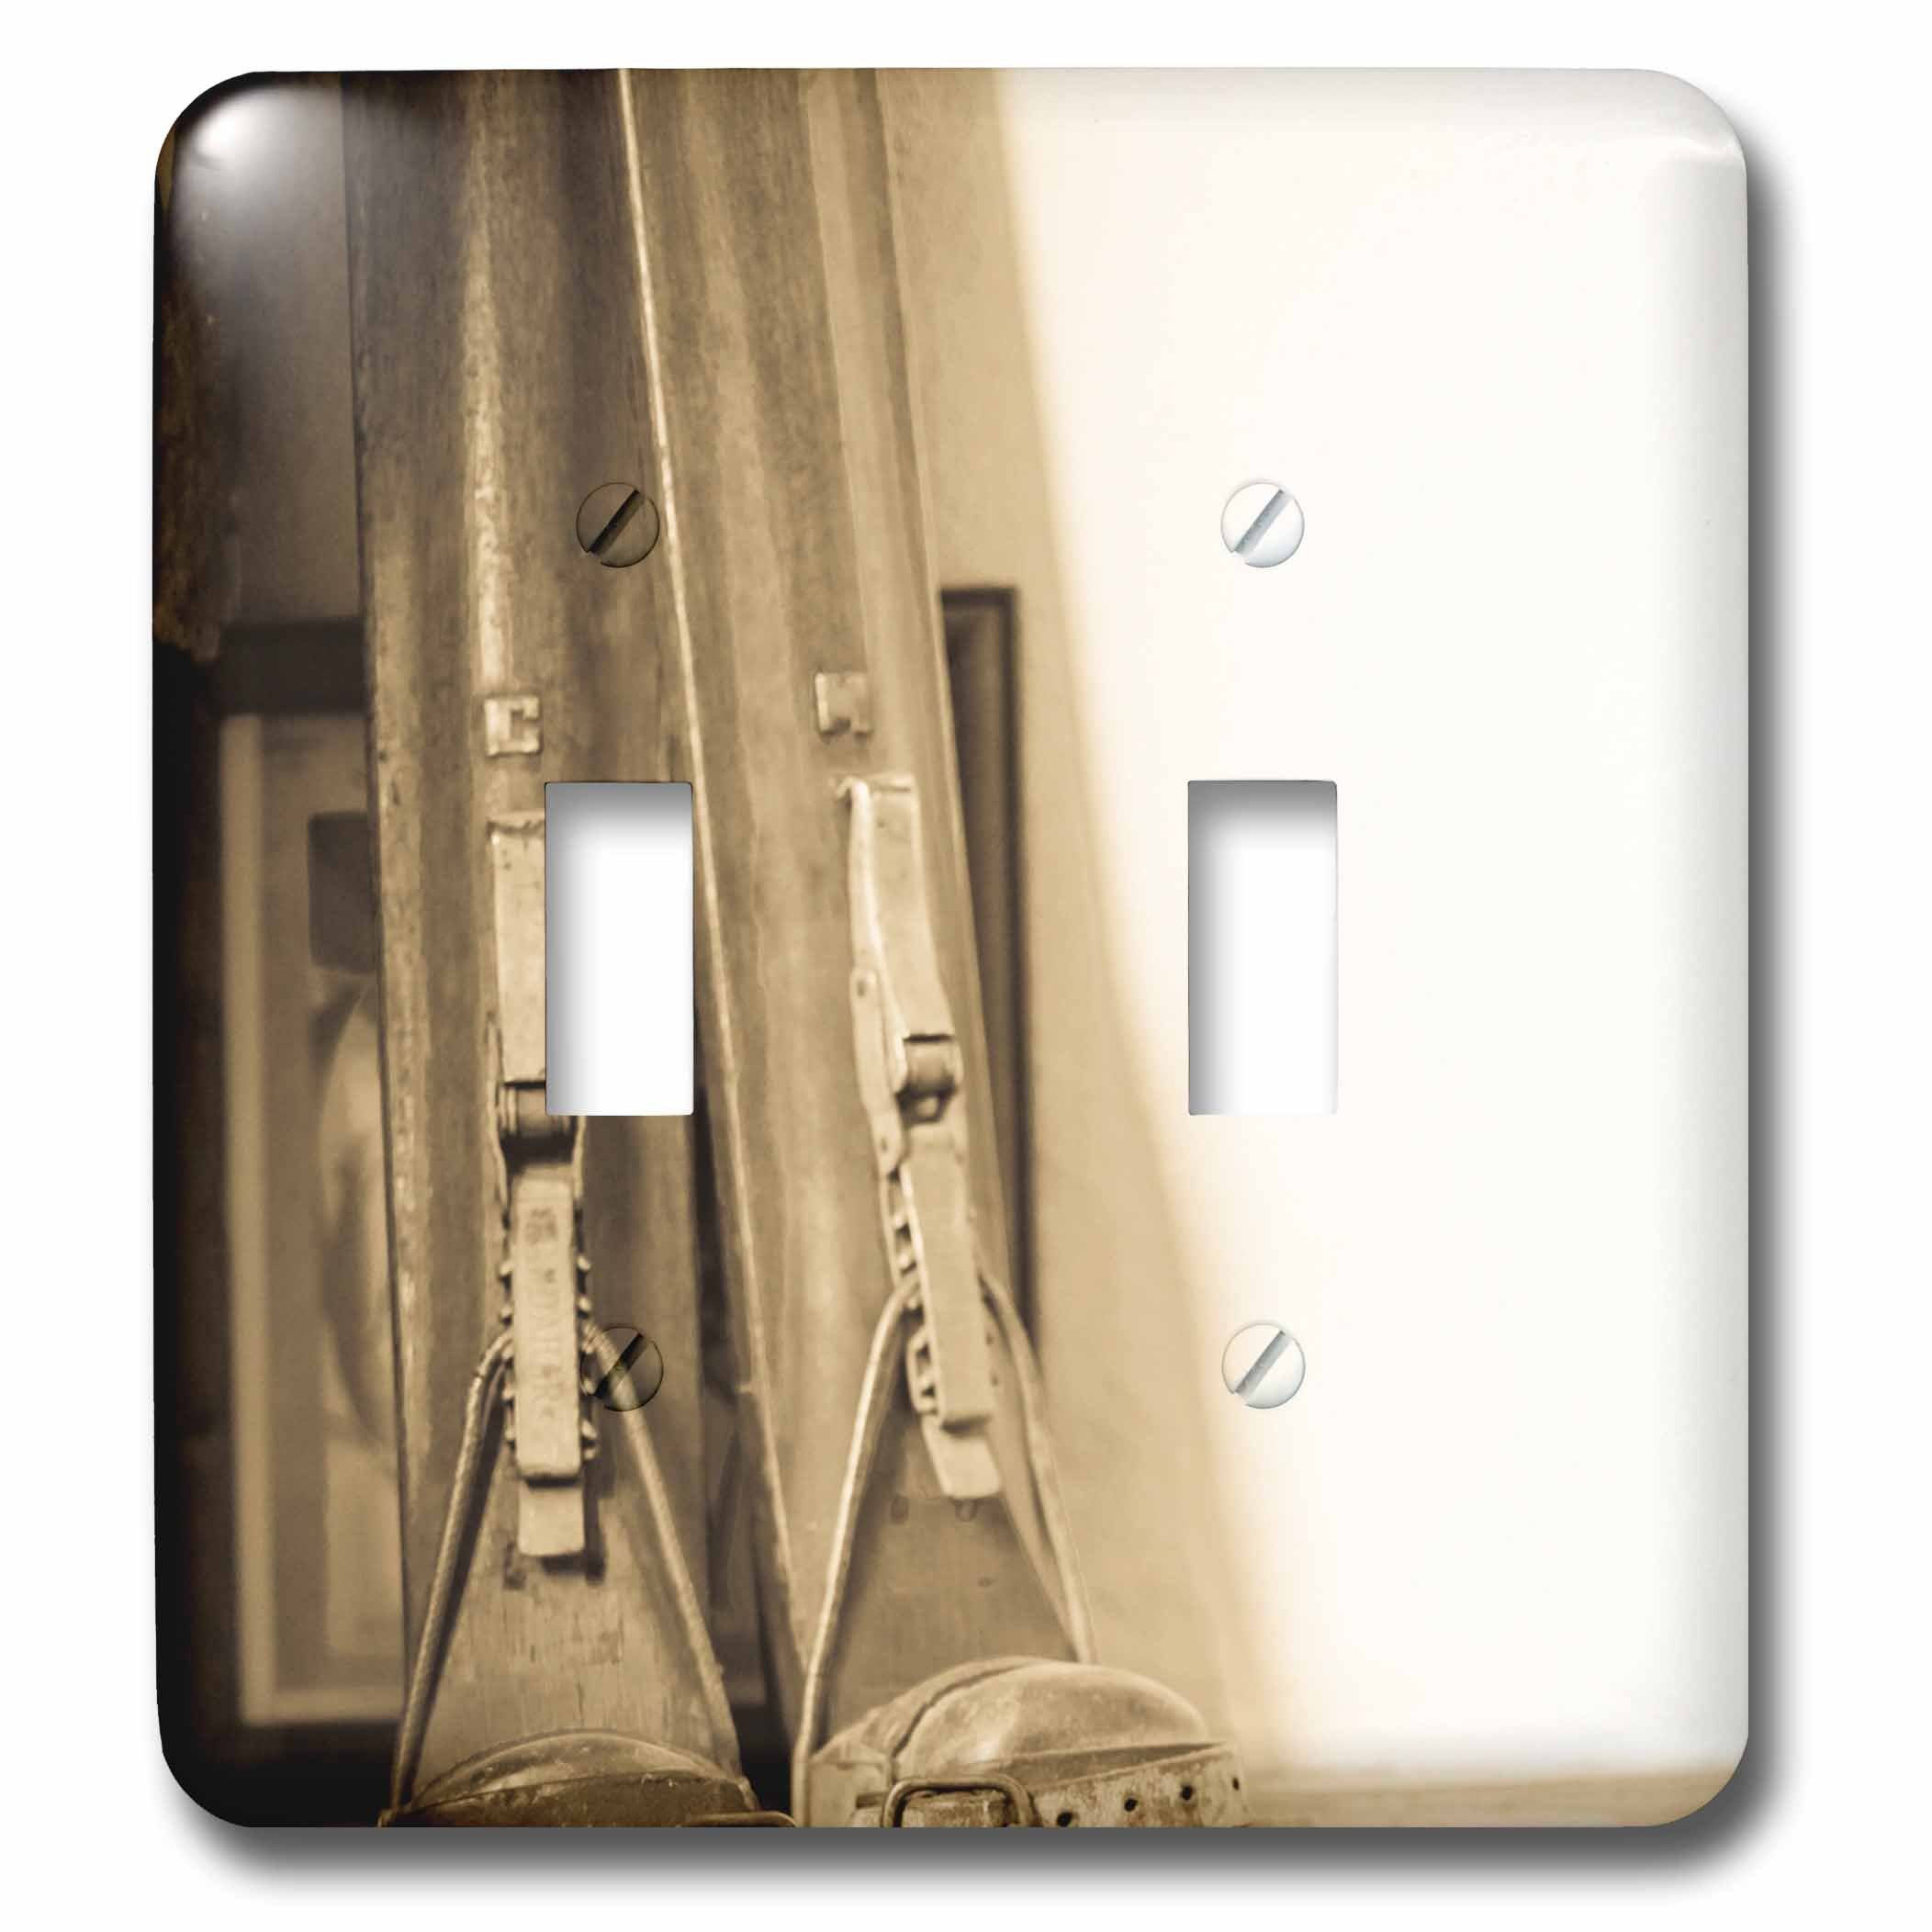 3dRose lsp_206459_2 Taos, New Mexico, USA. Taos Ski Valley. Hotel Saint Bernard. Double Toggle Switch